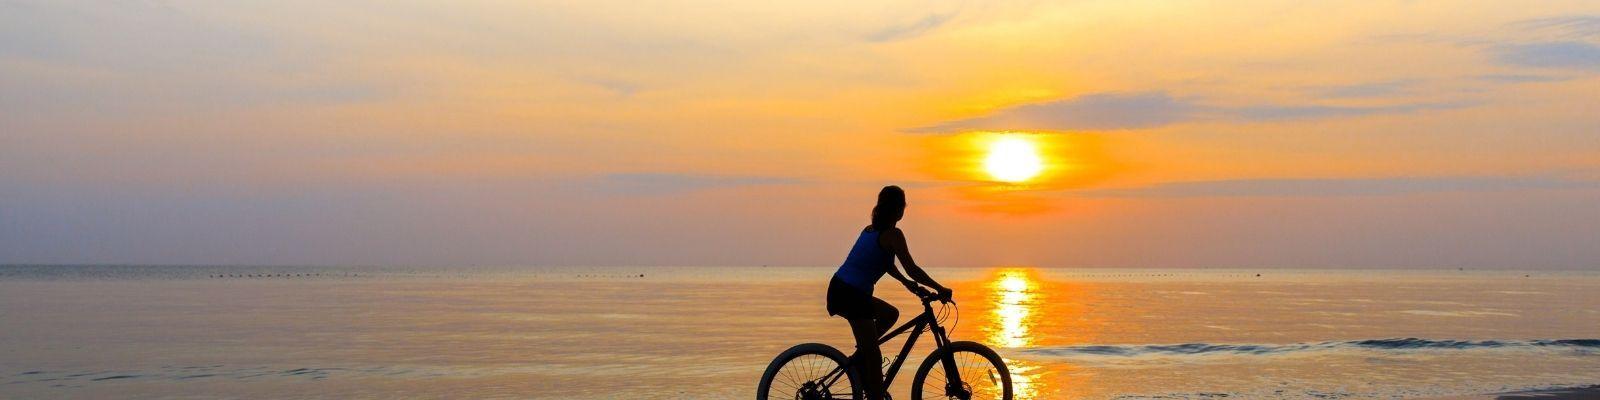 woman biking at sunset